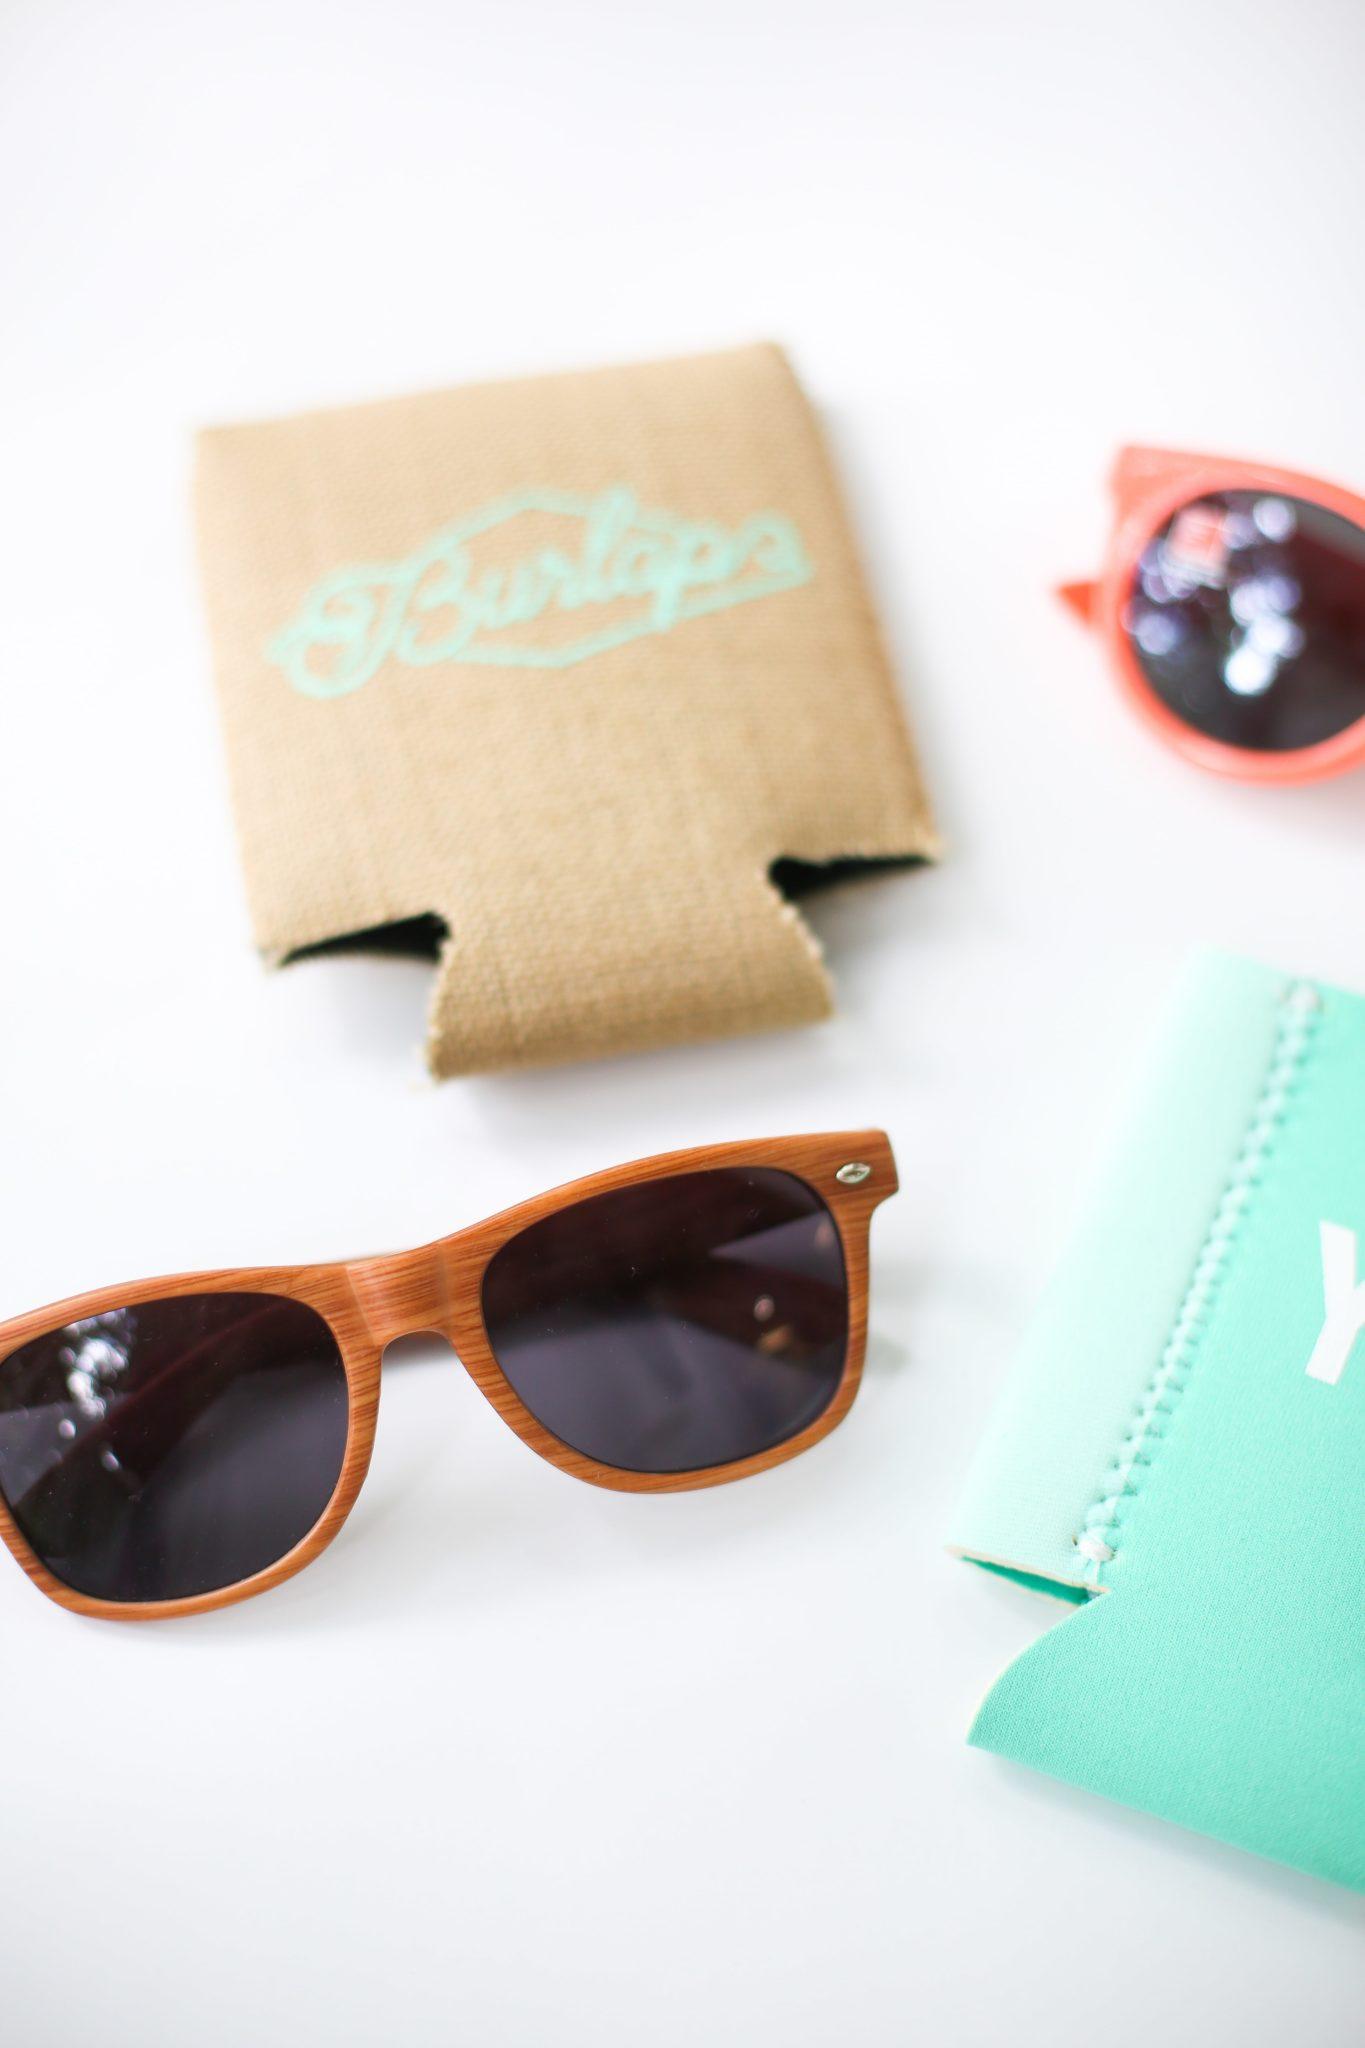 charleston cotton exchange custom printed wallets and glasses